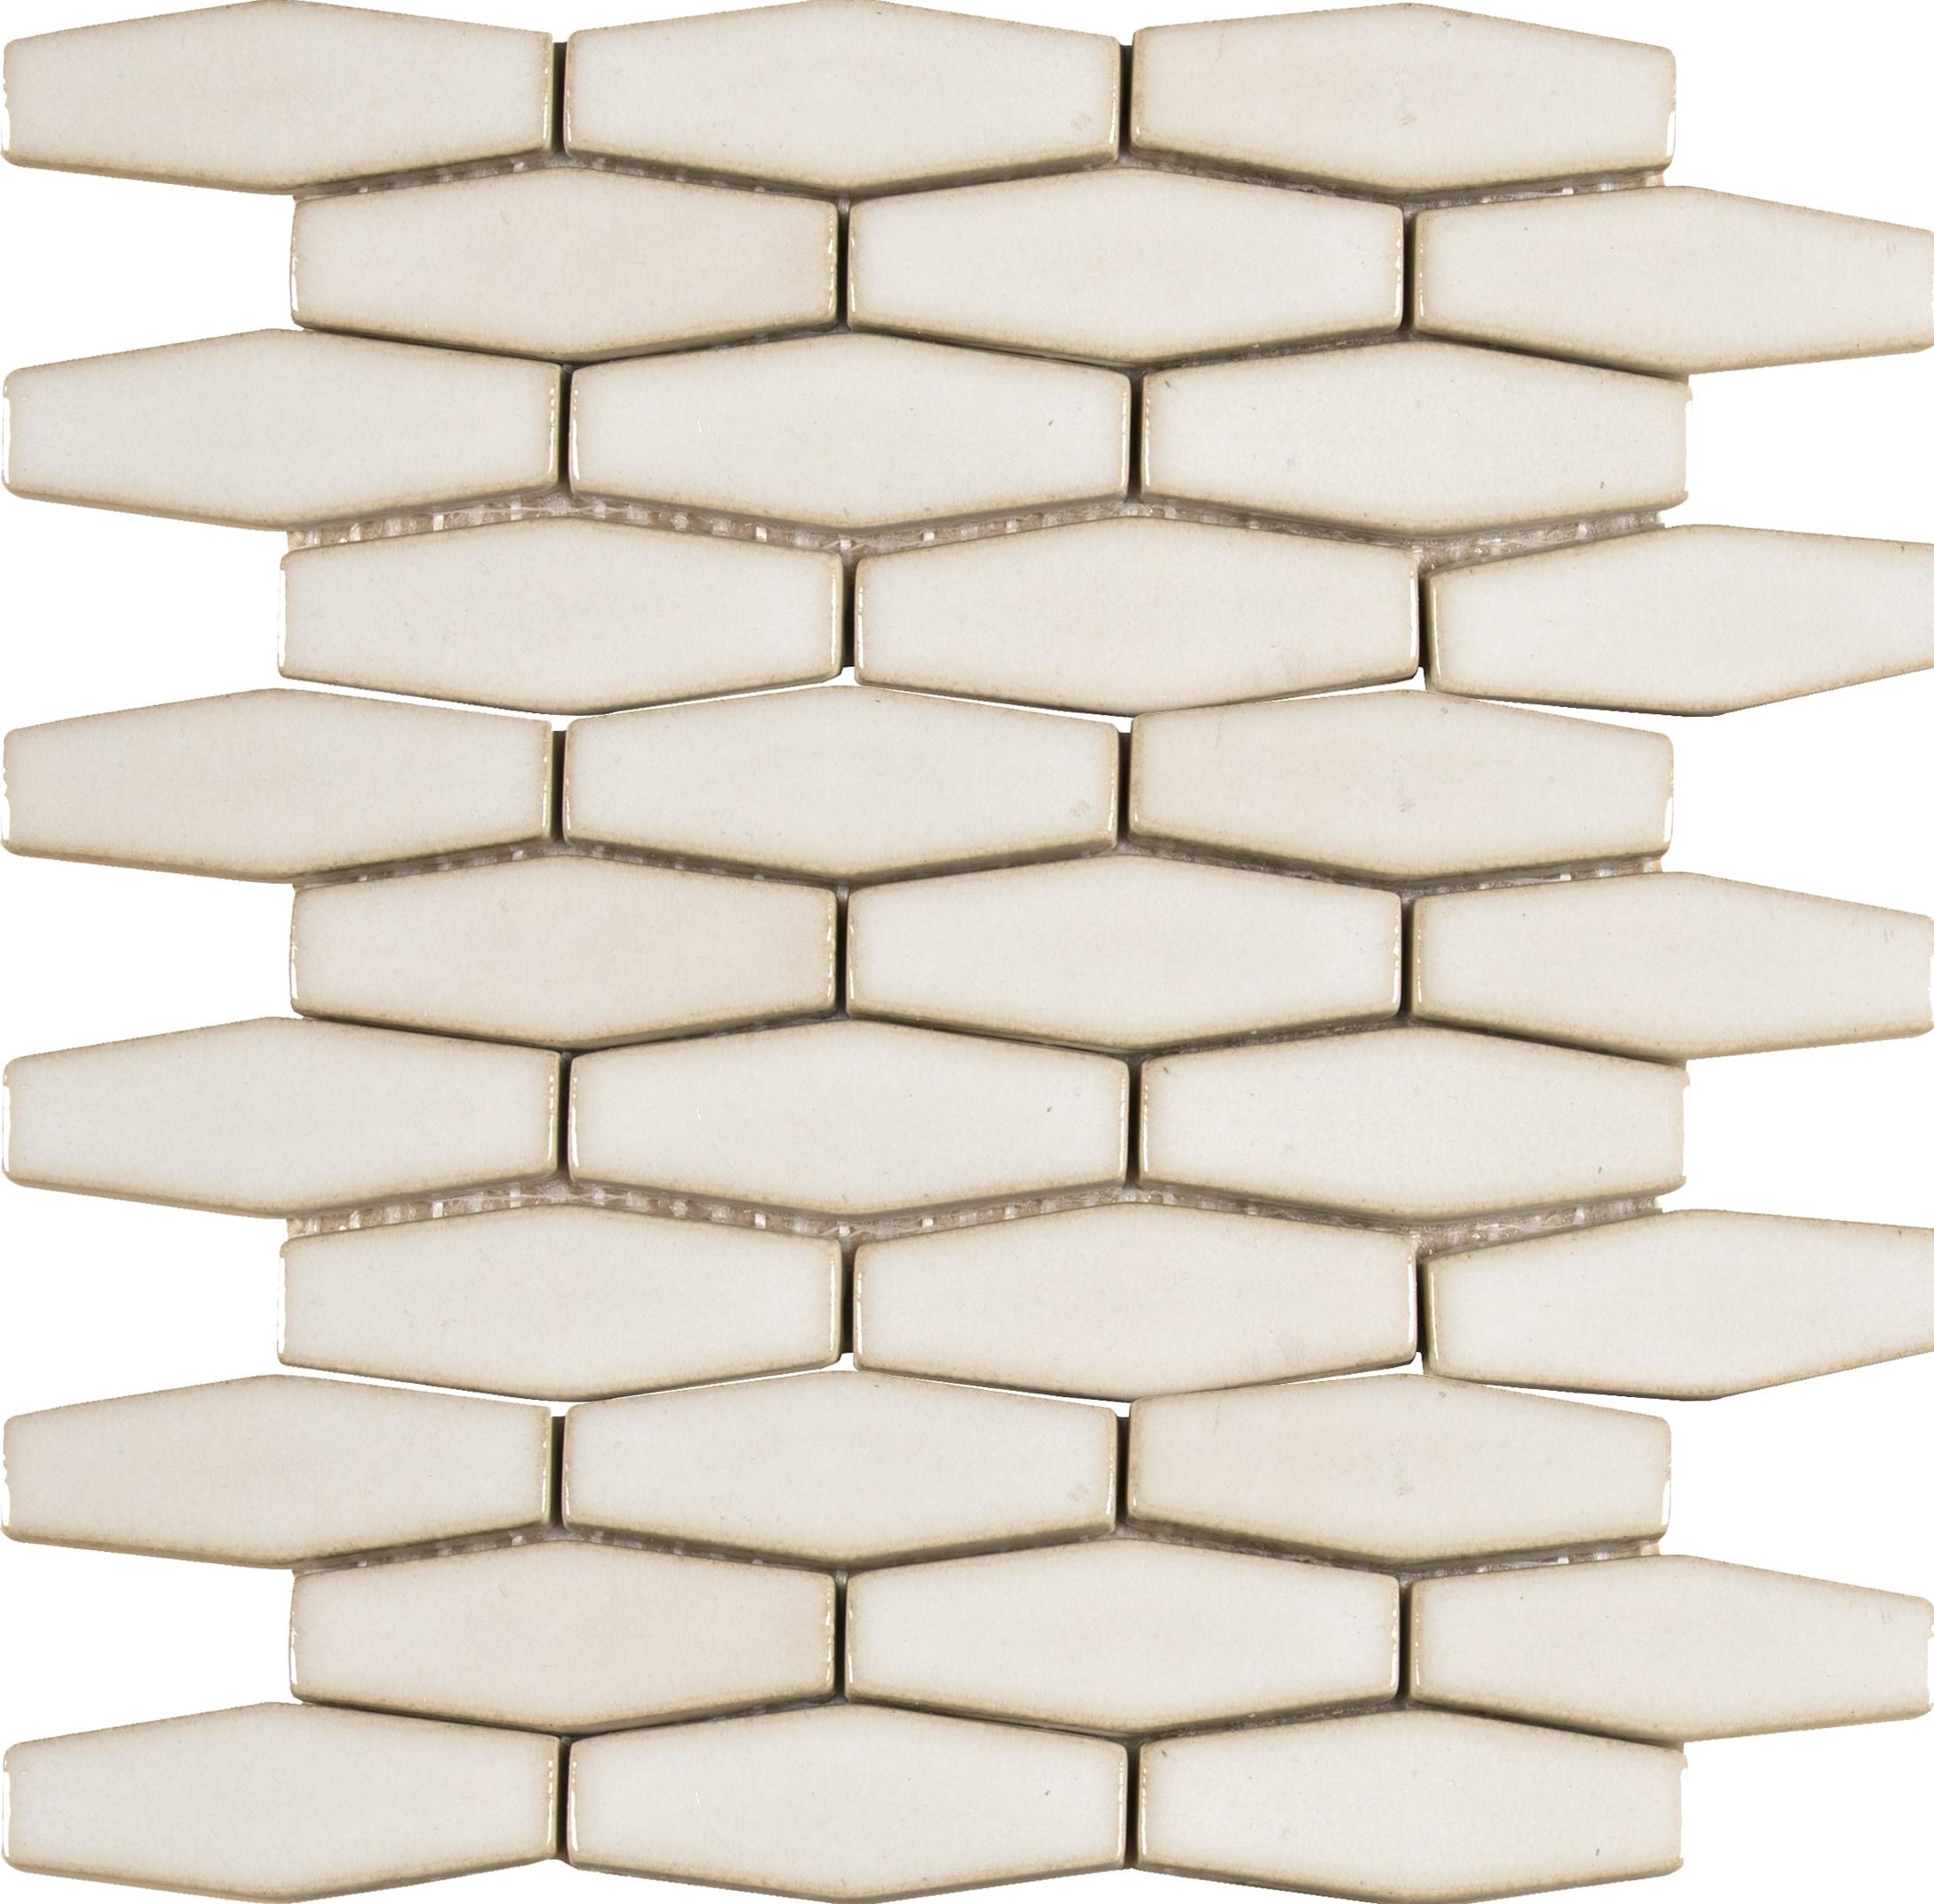 Elongated Hexagon 8mm / Pattern / Glossy Ceramic Tile - Antique White 0